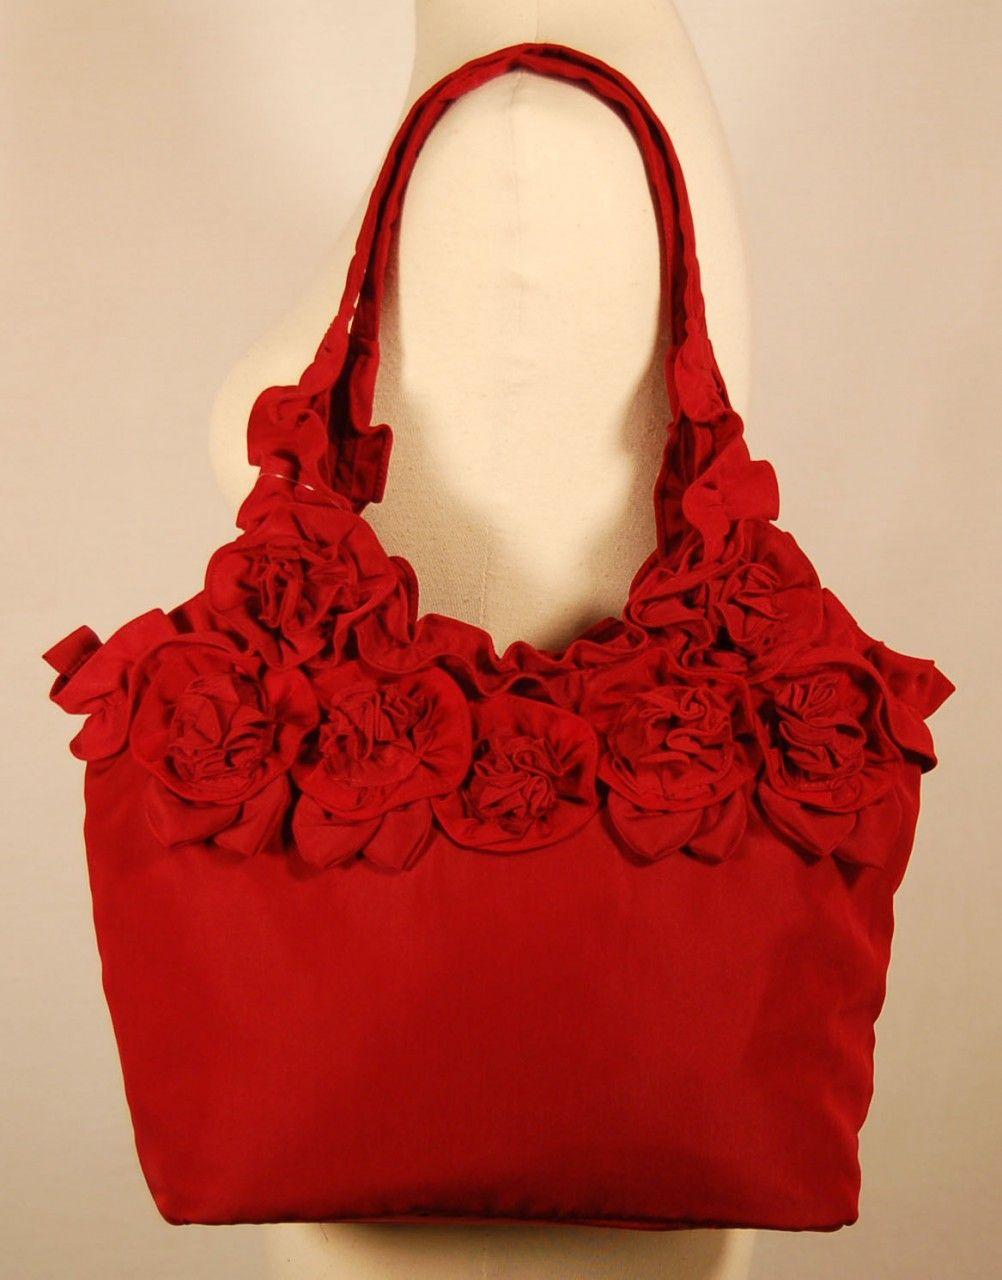 f56f4a84a red flower hand bag - from Janny's Beach House $29.95 Cor Vermelha, Vermelho,  Sonhos